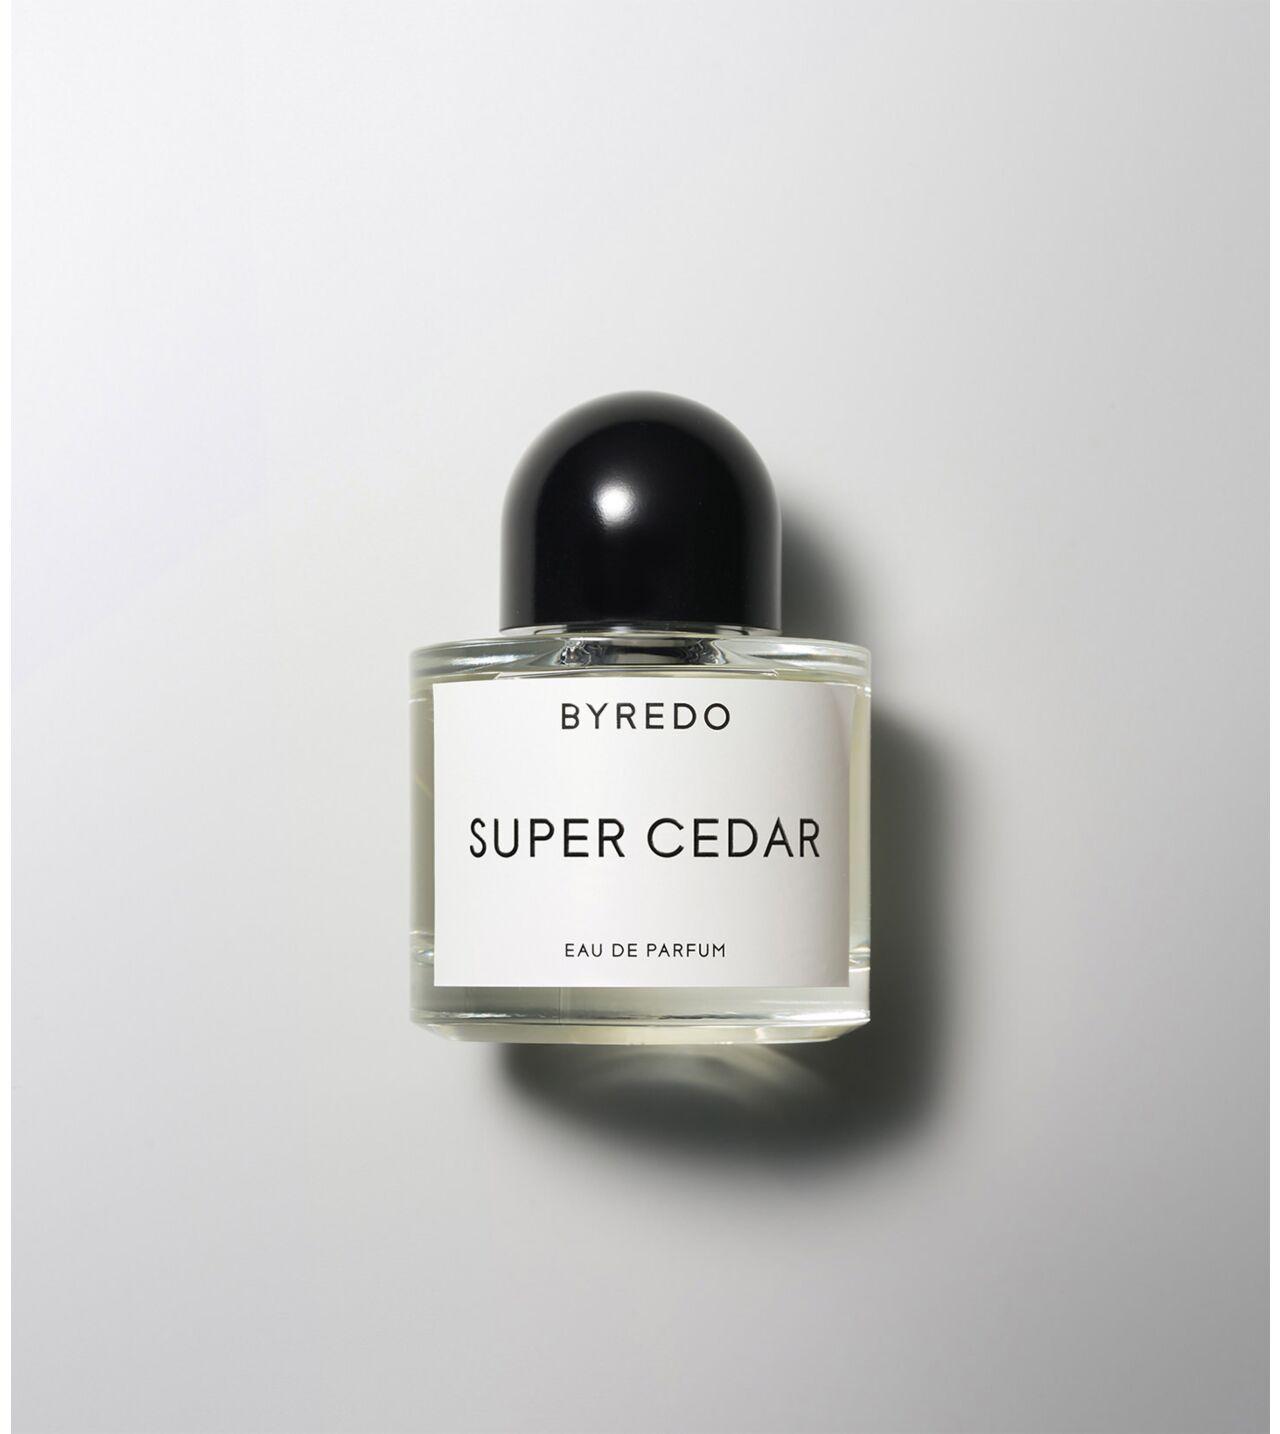 Picture of Byredo Super cedar Eau de Parfum